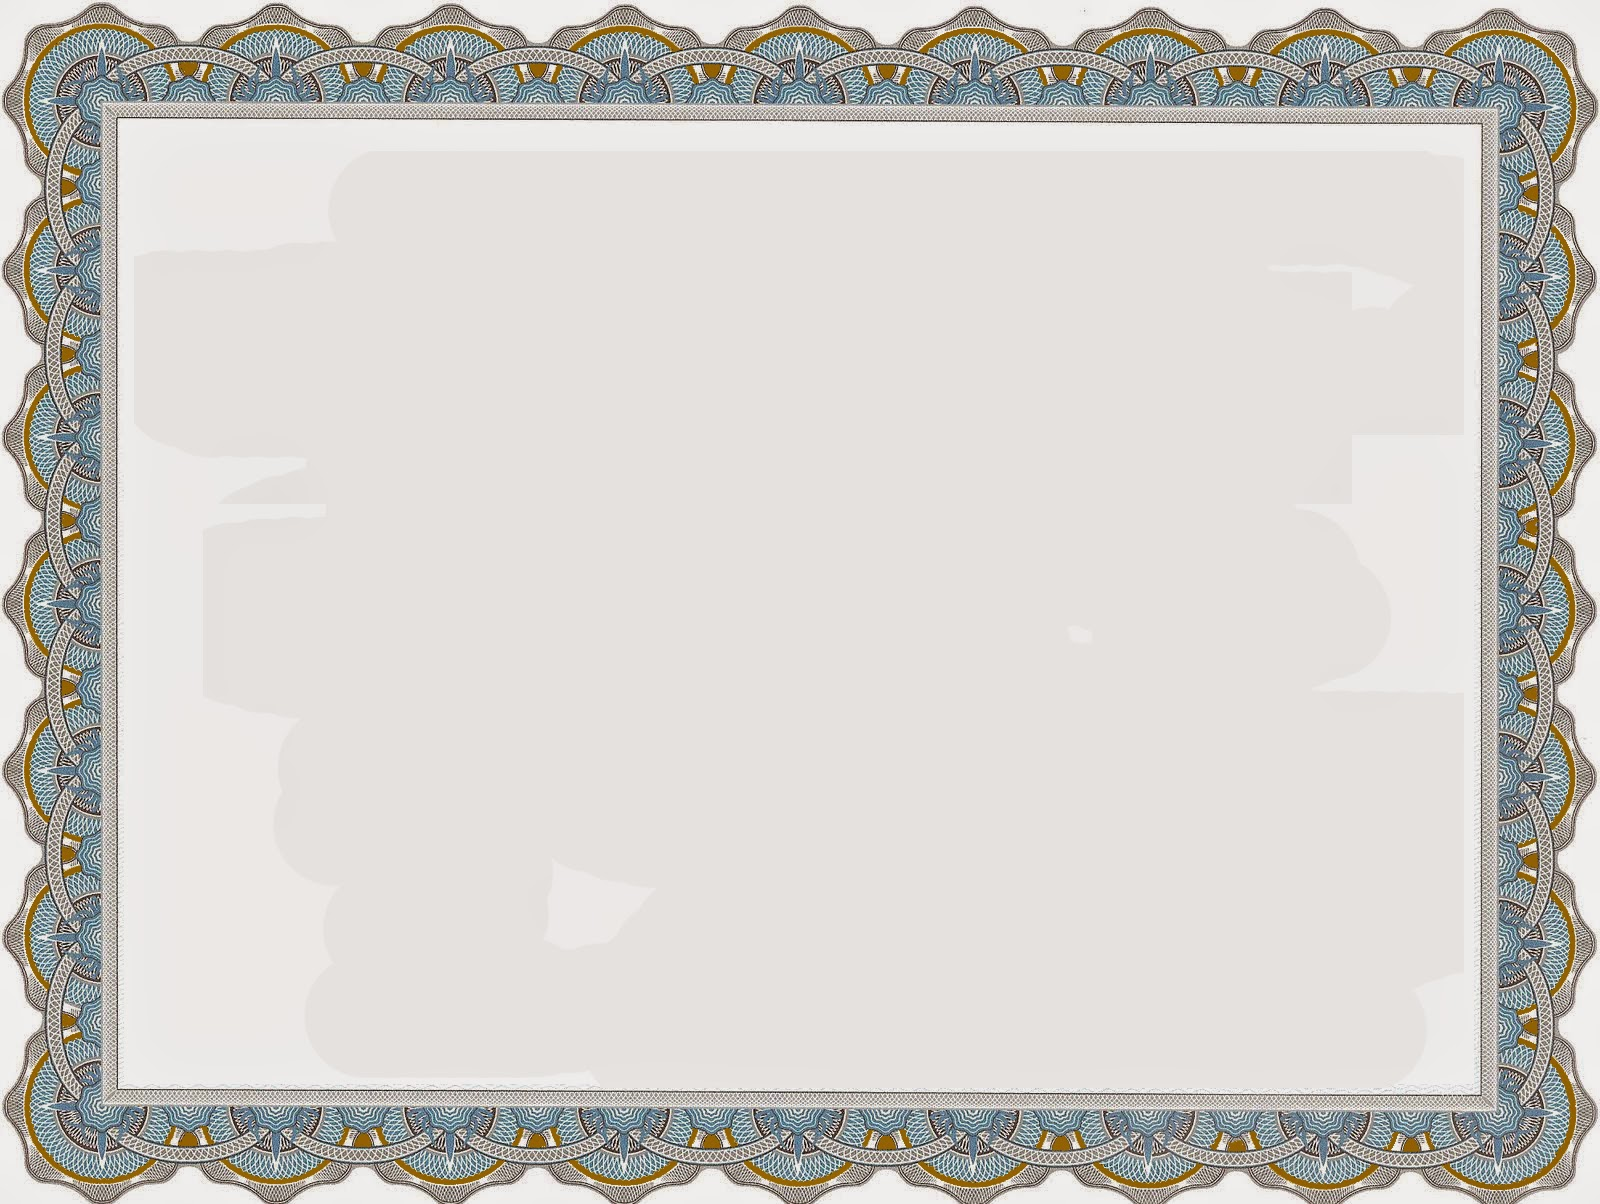 VeraFOXbas3: Design Background Piagam